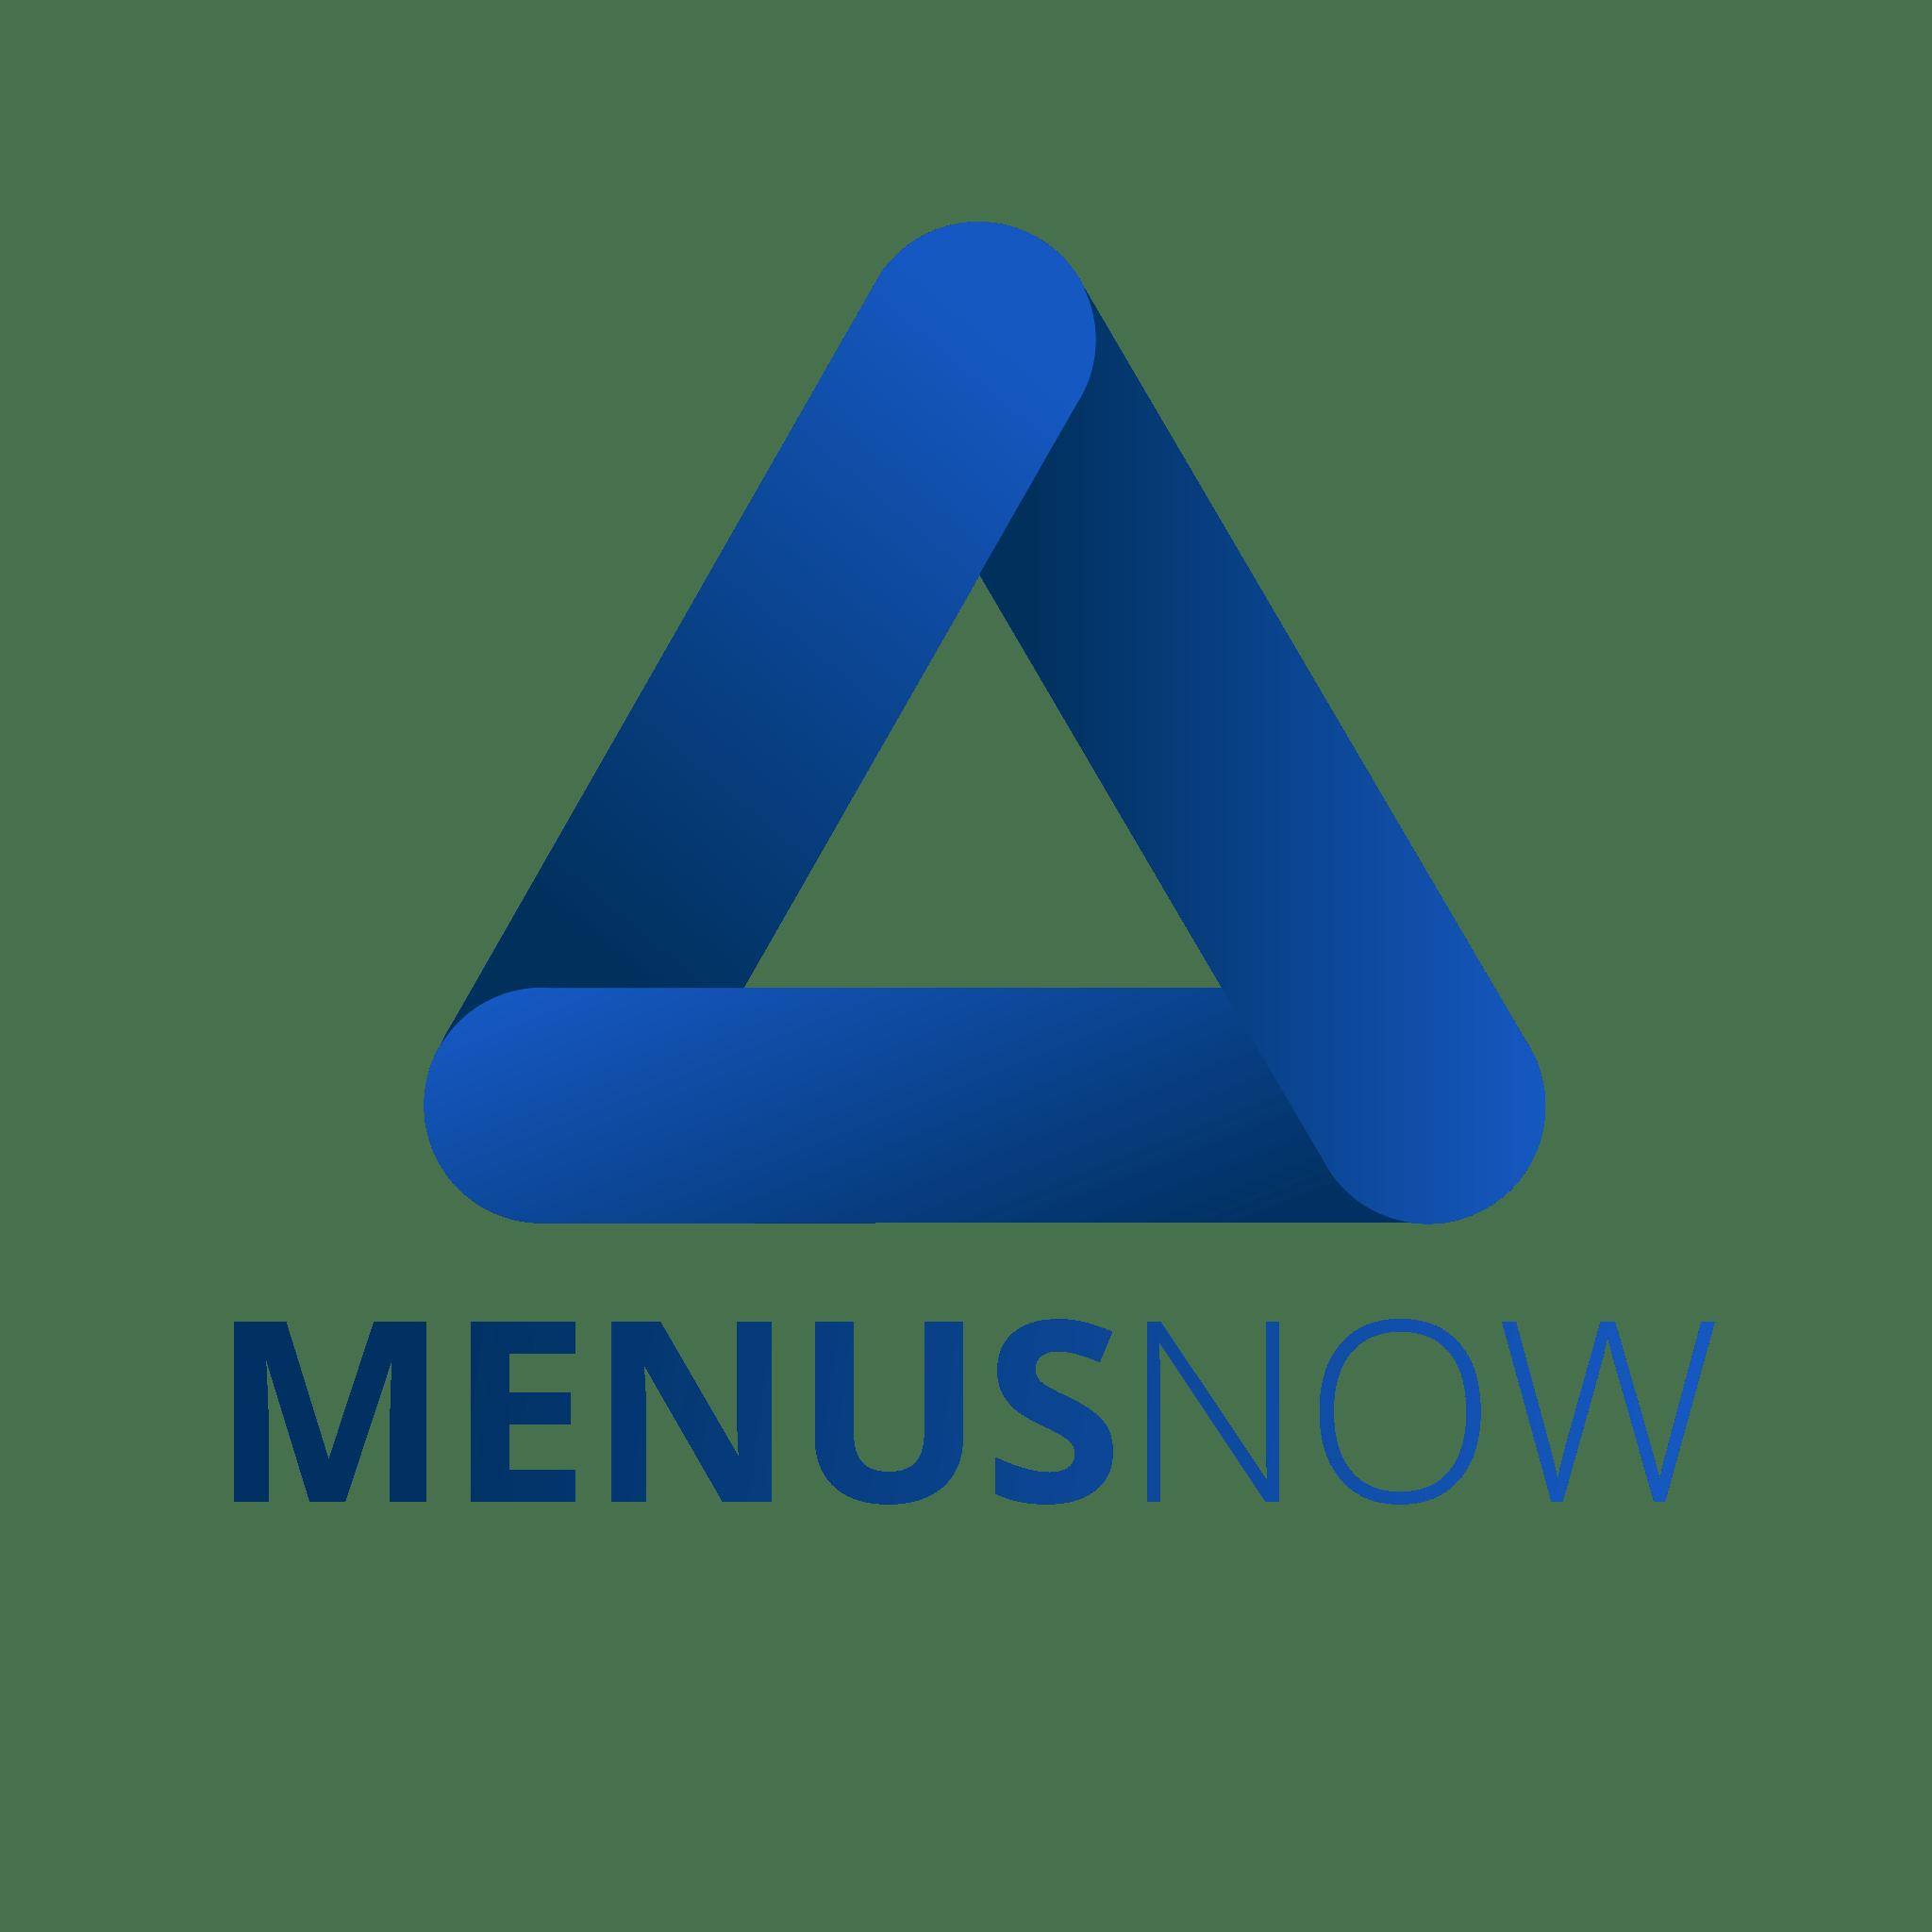 MenusNow: Contactless Digital Menu Service